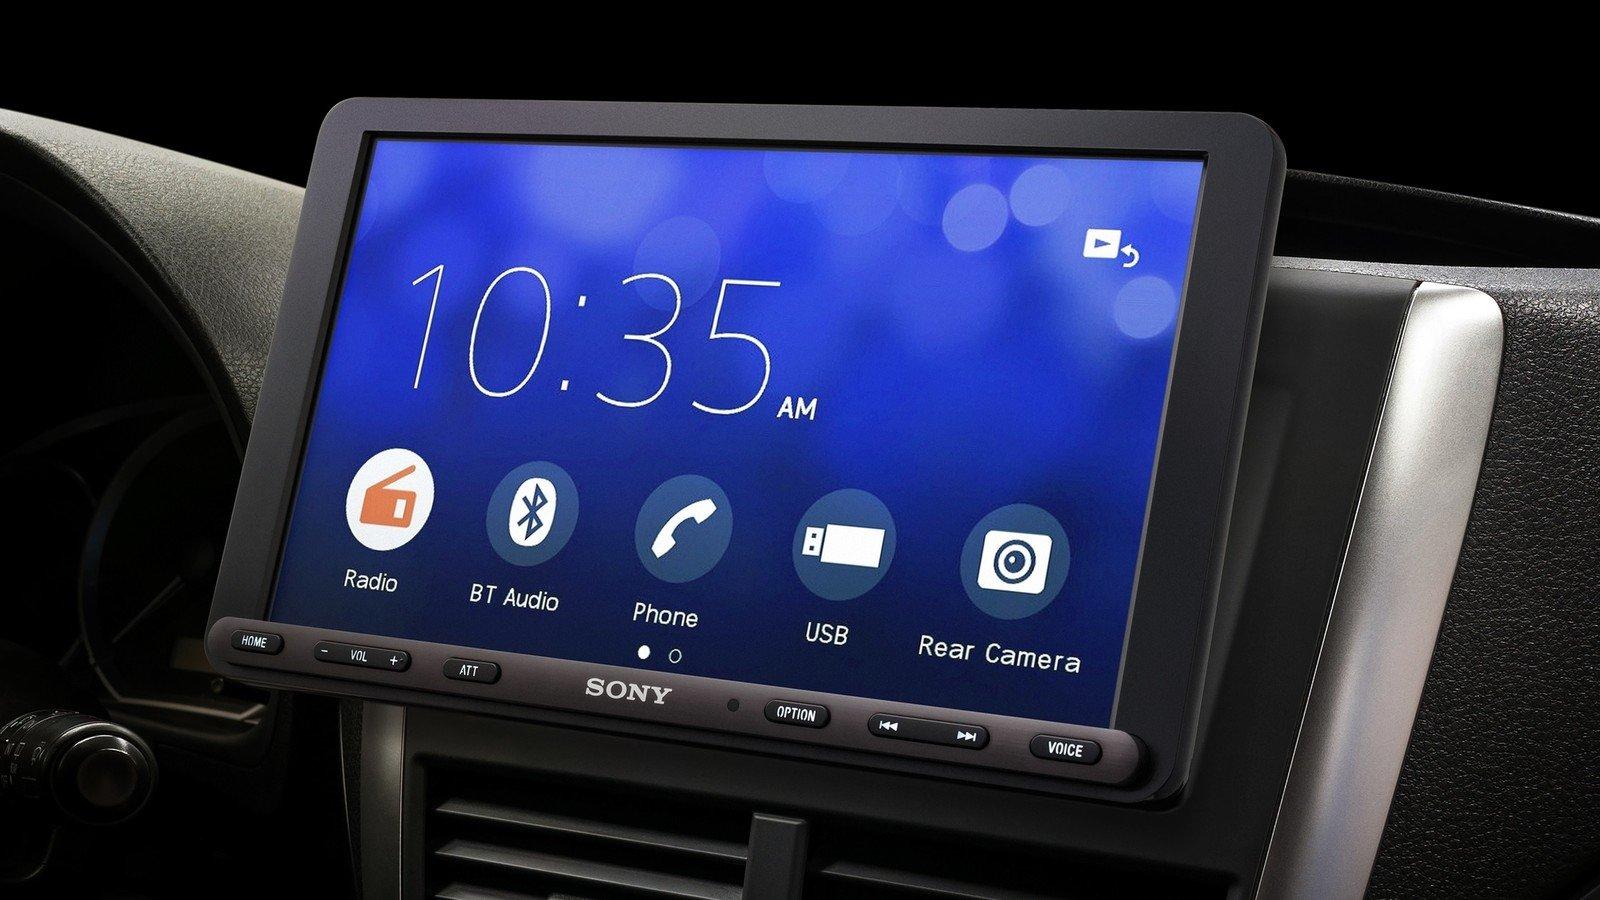 Sony Xav Ax8000 Car Stereo with menu on display in a car